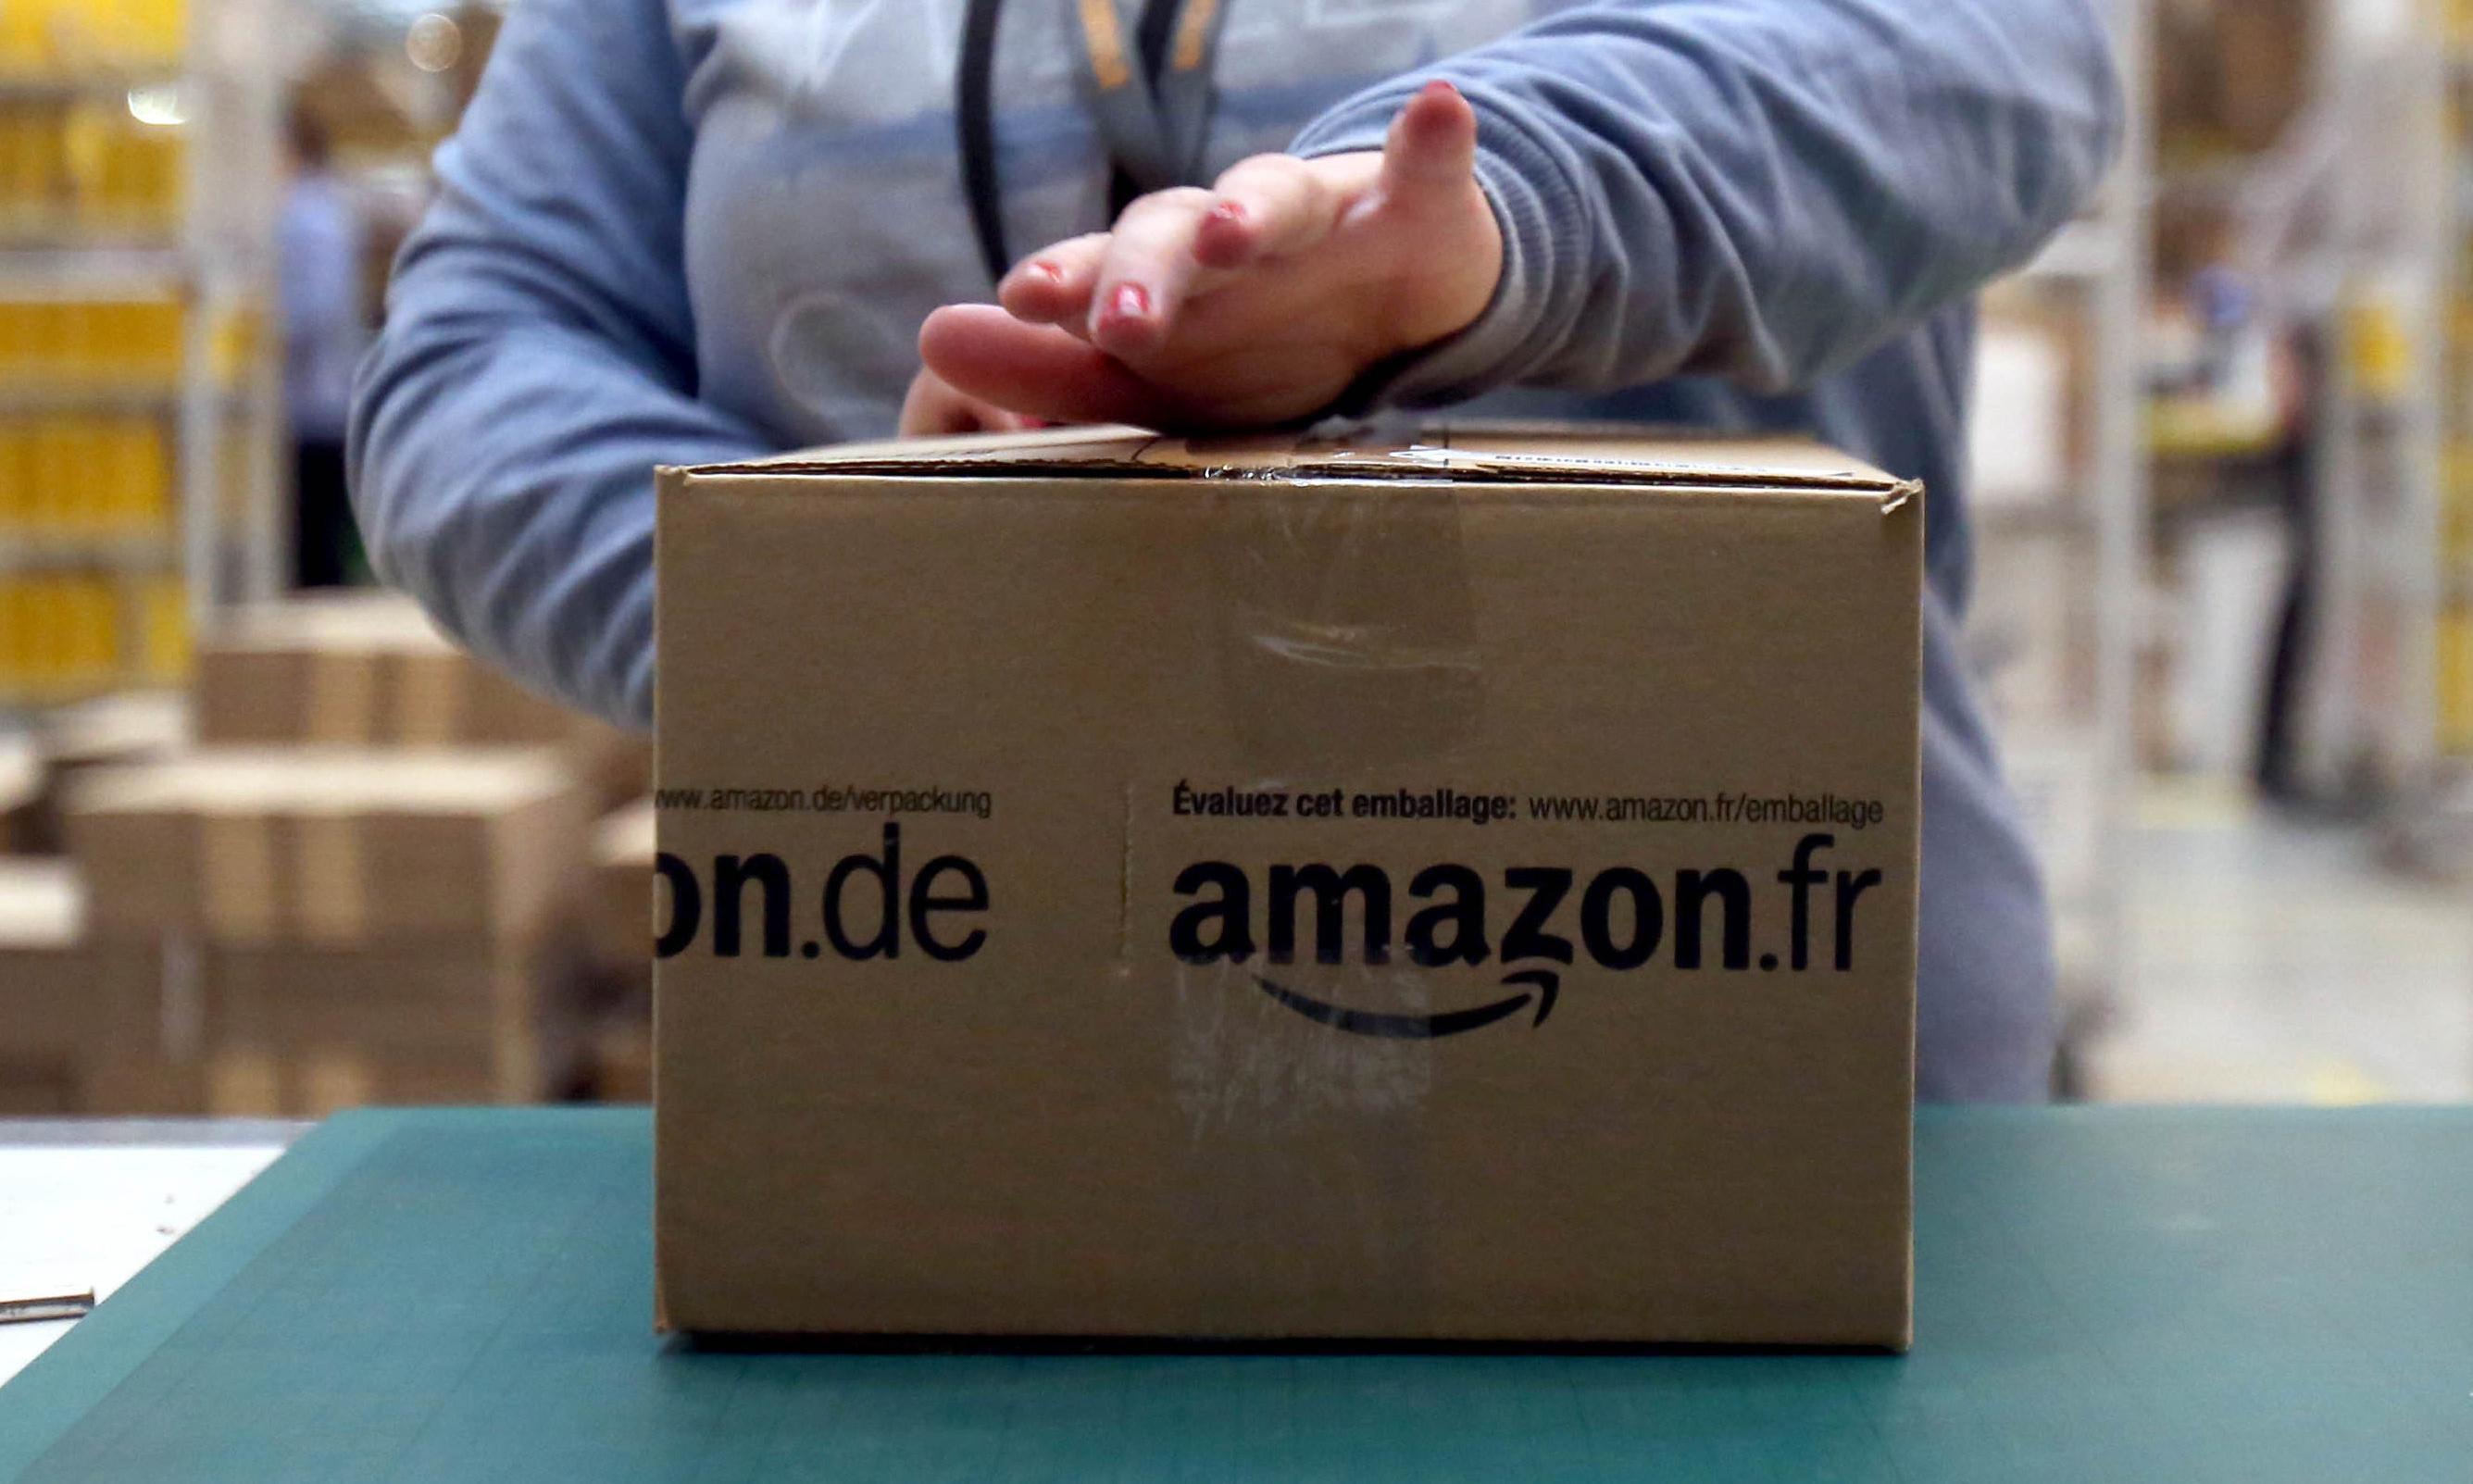 Amazon creates 600 technology jobs in Manchester